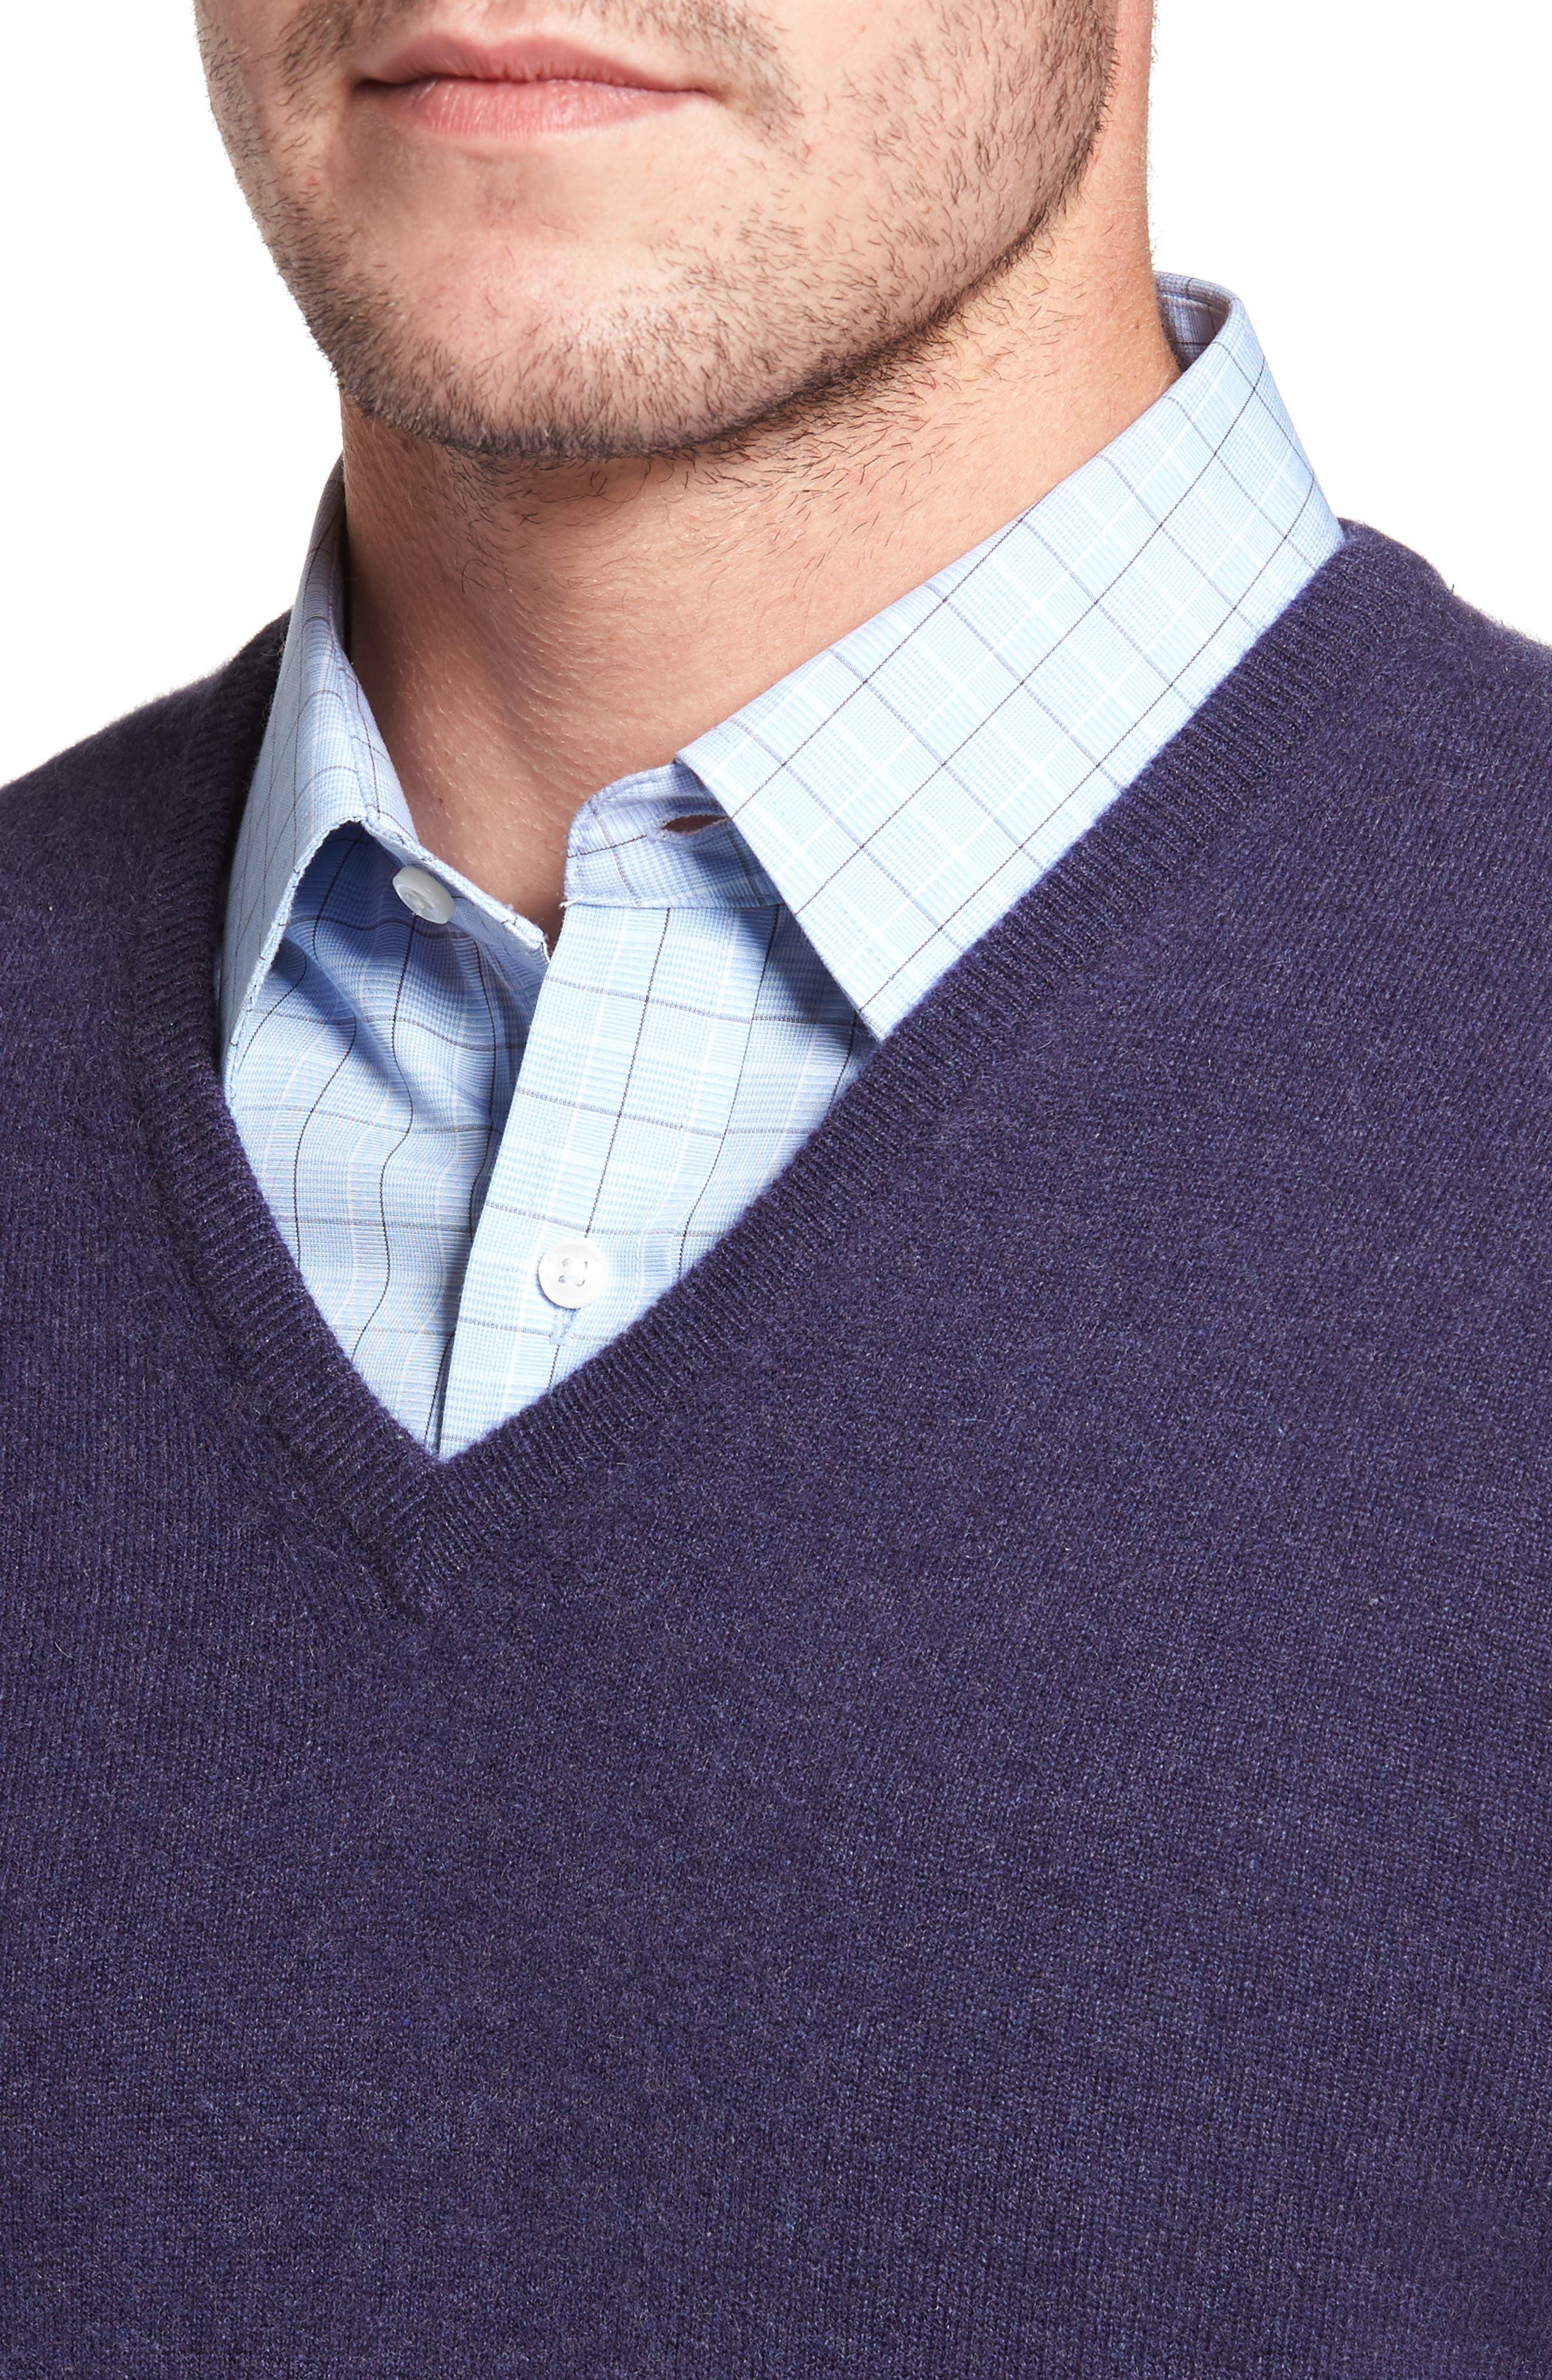 Cashmere V-Neck Sweater,                             Alternate thumbnail 23, color,